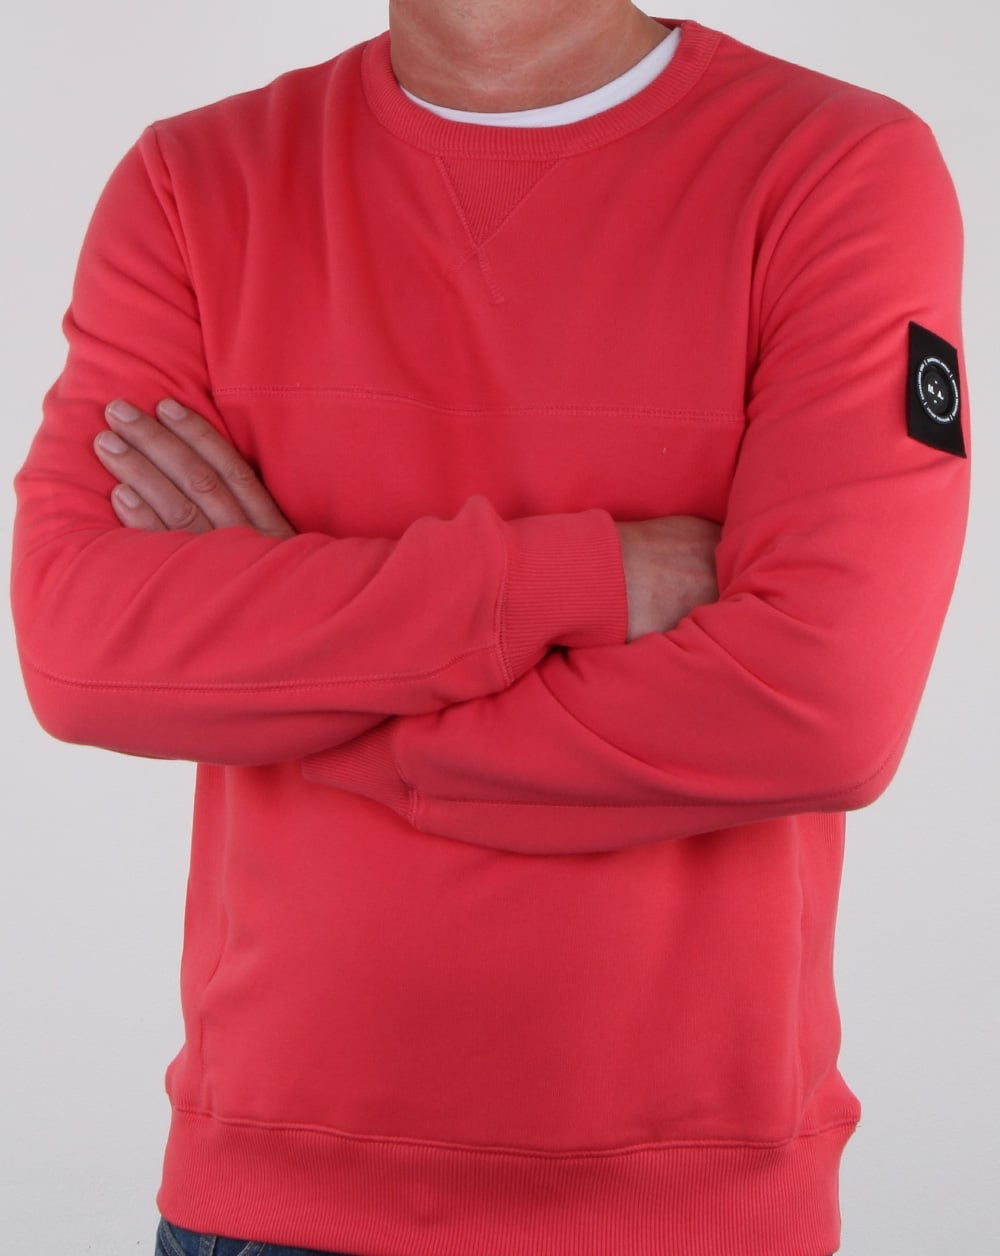 Marshall Artist Sweatshirts